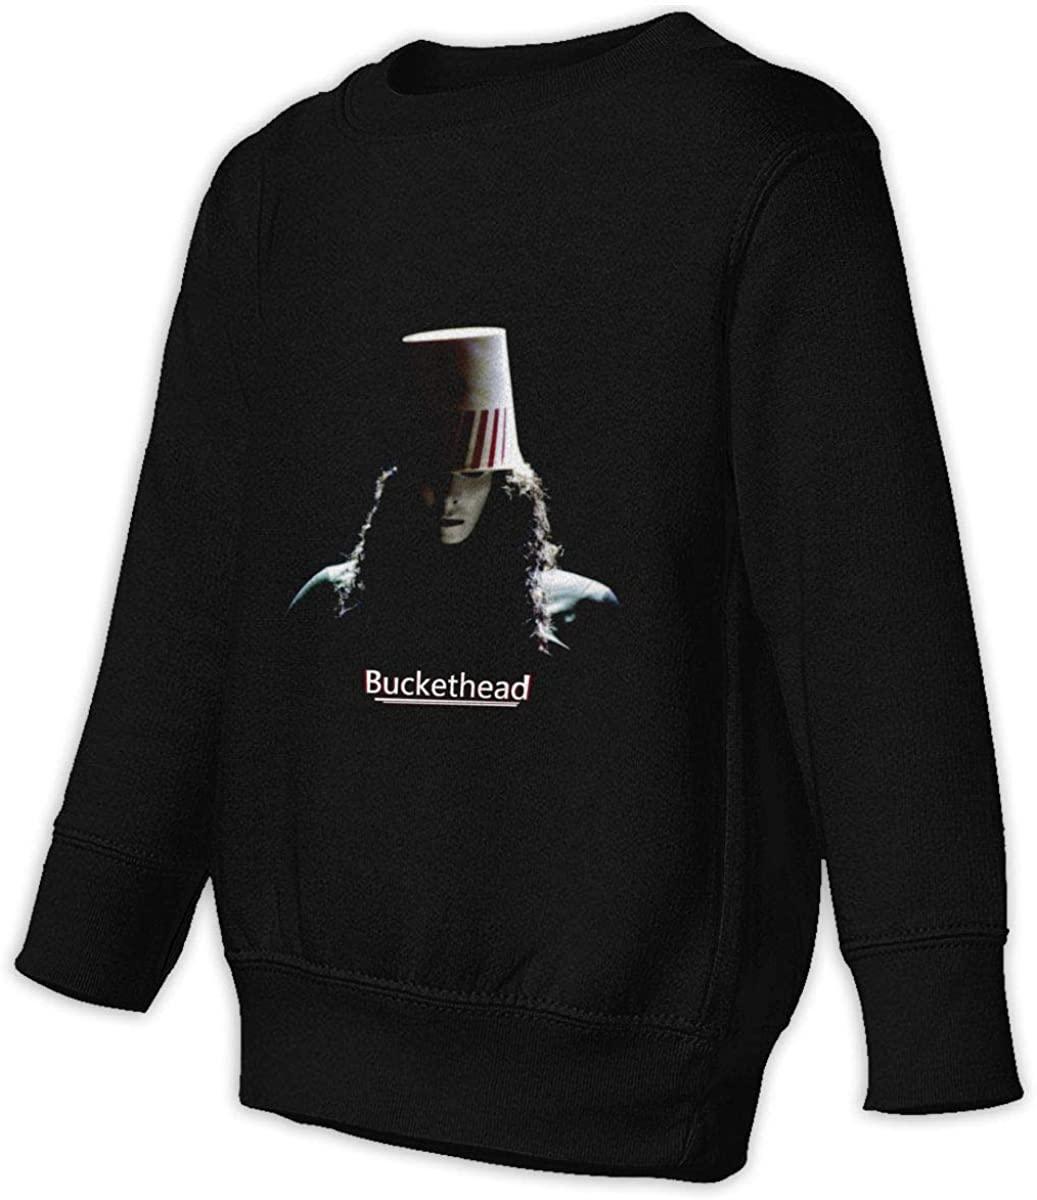 BodiGulick Buckethead Boys and Girls Sweatshirts, Cotton Sports Tops Sweatshirt Black